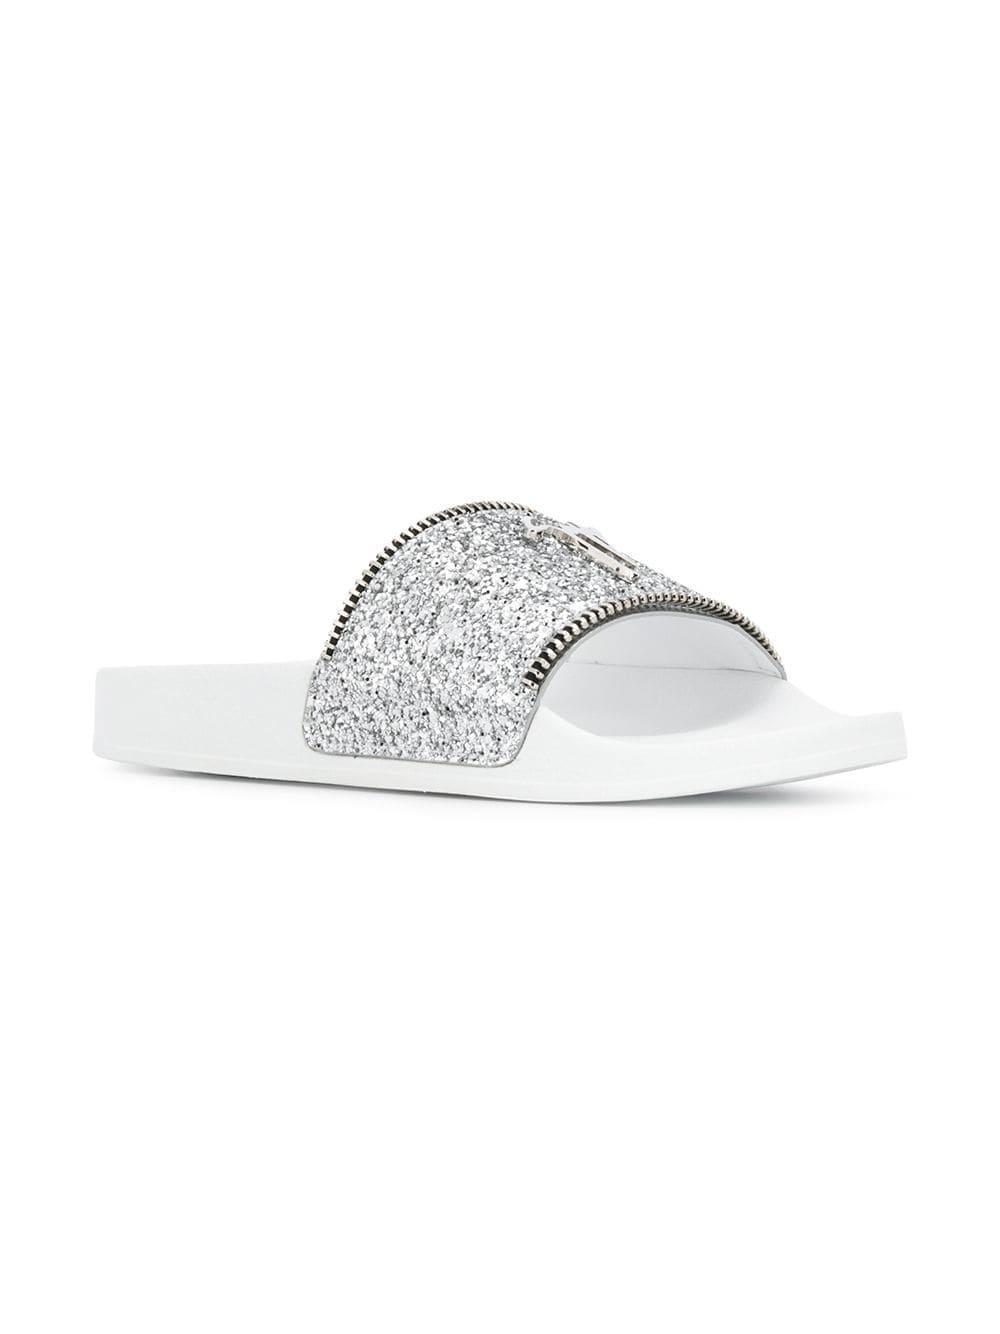 b3a1c19da Lyst - Giuseppe Zanotti Silver Glitter Blytter Slides in Metallic ...